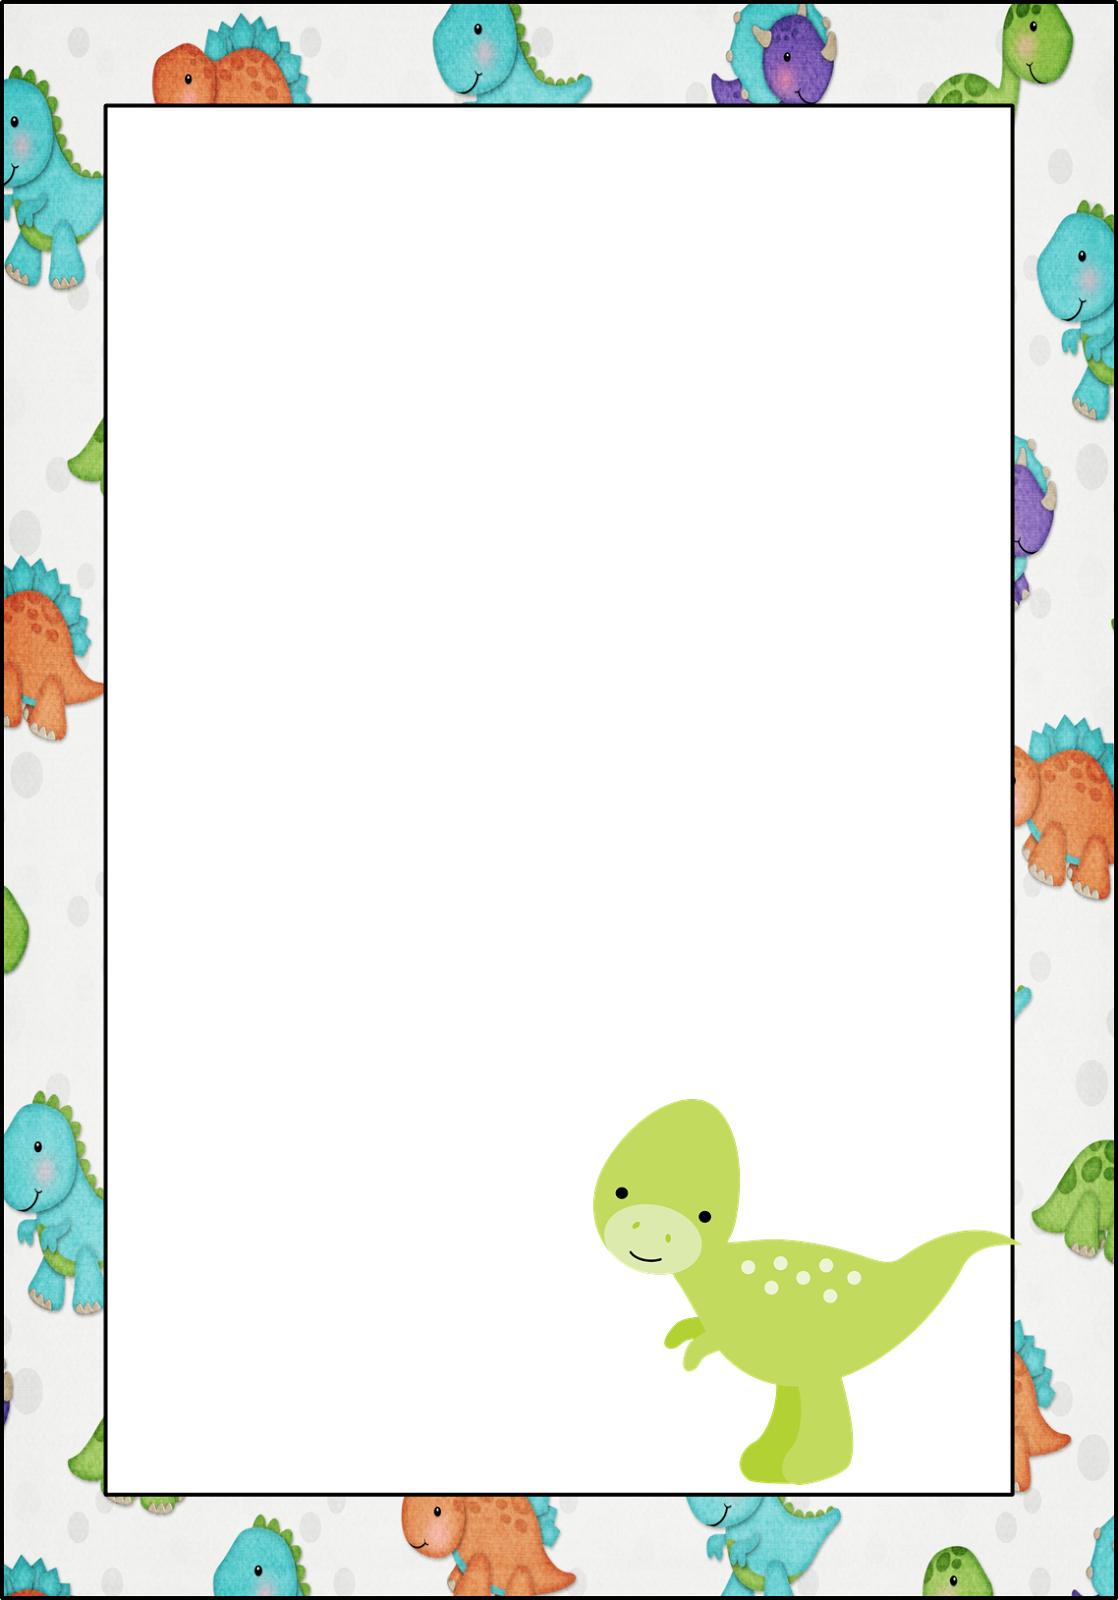 Dinosaur Babies Free Printable Frames Invitations Cards